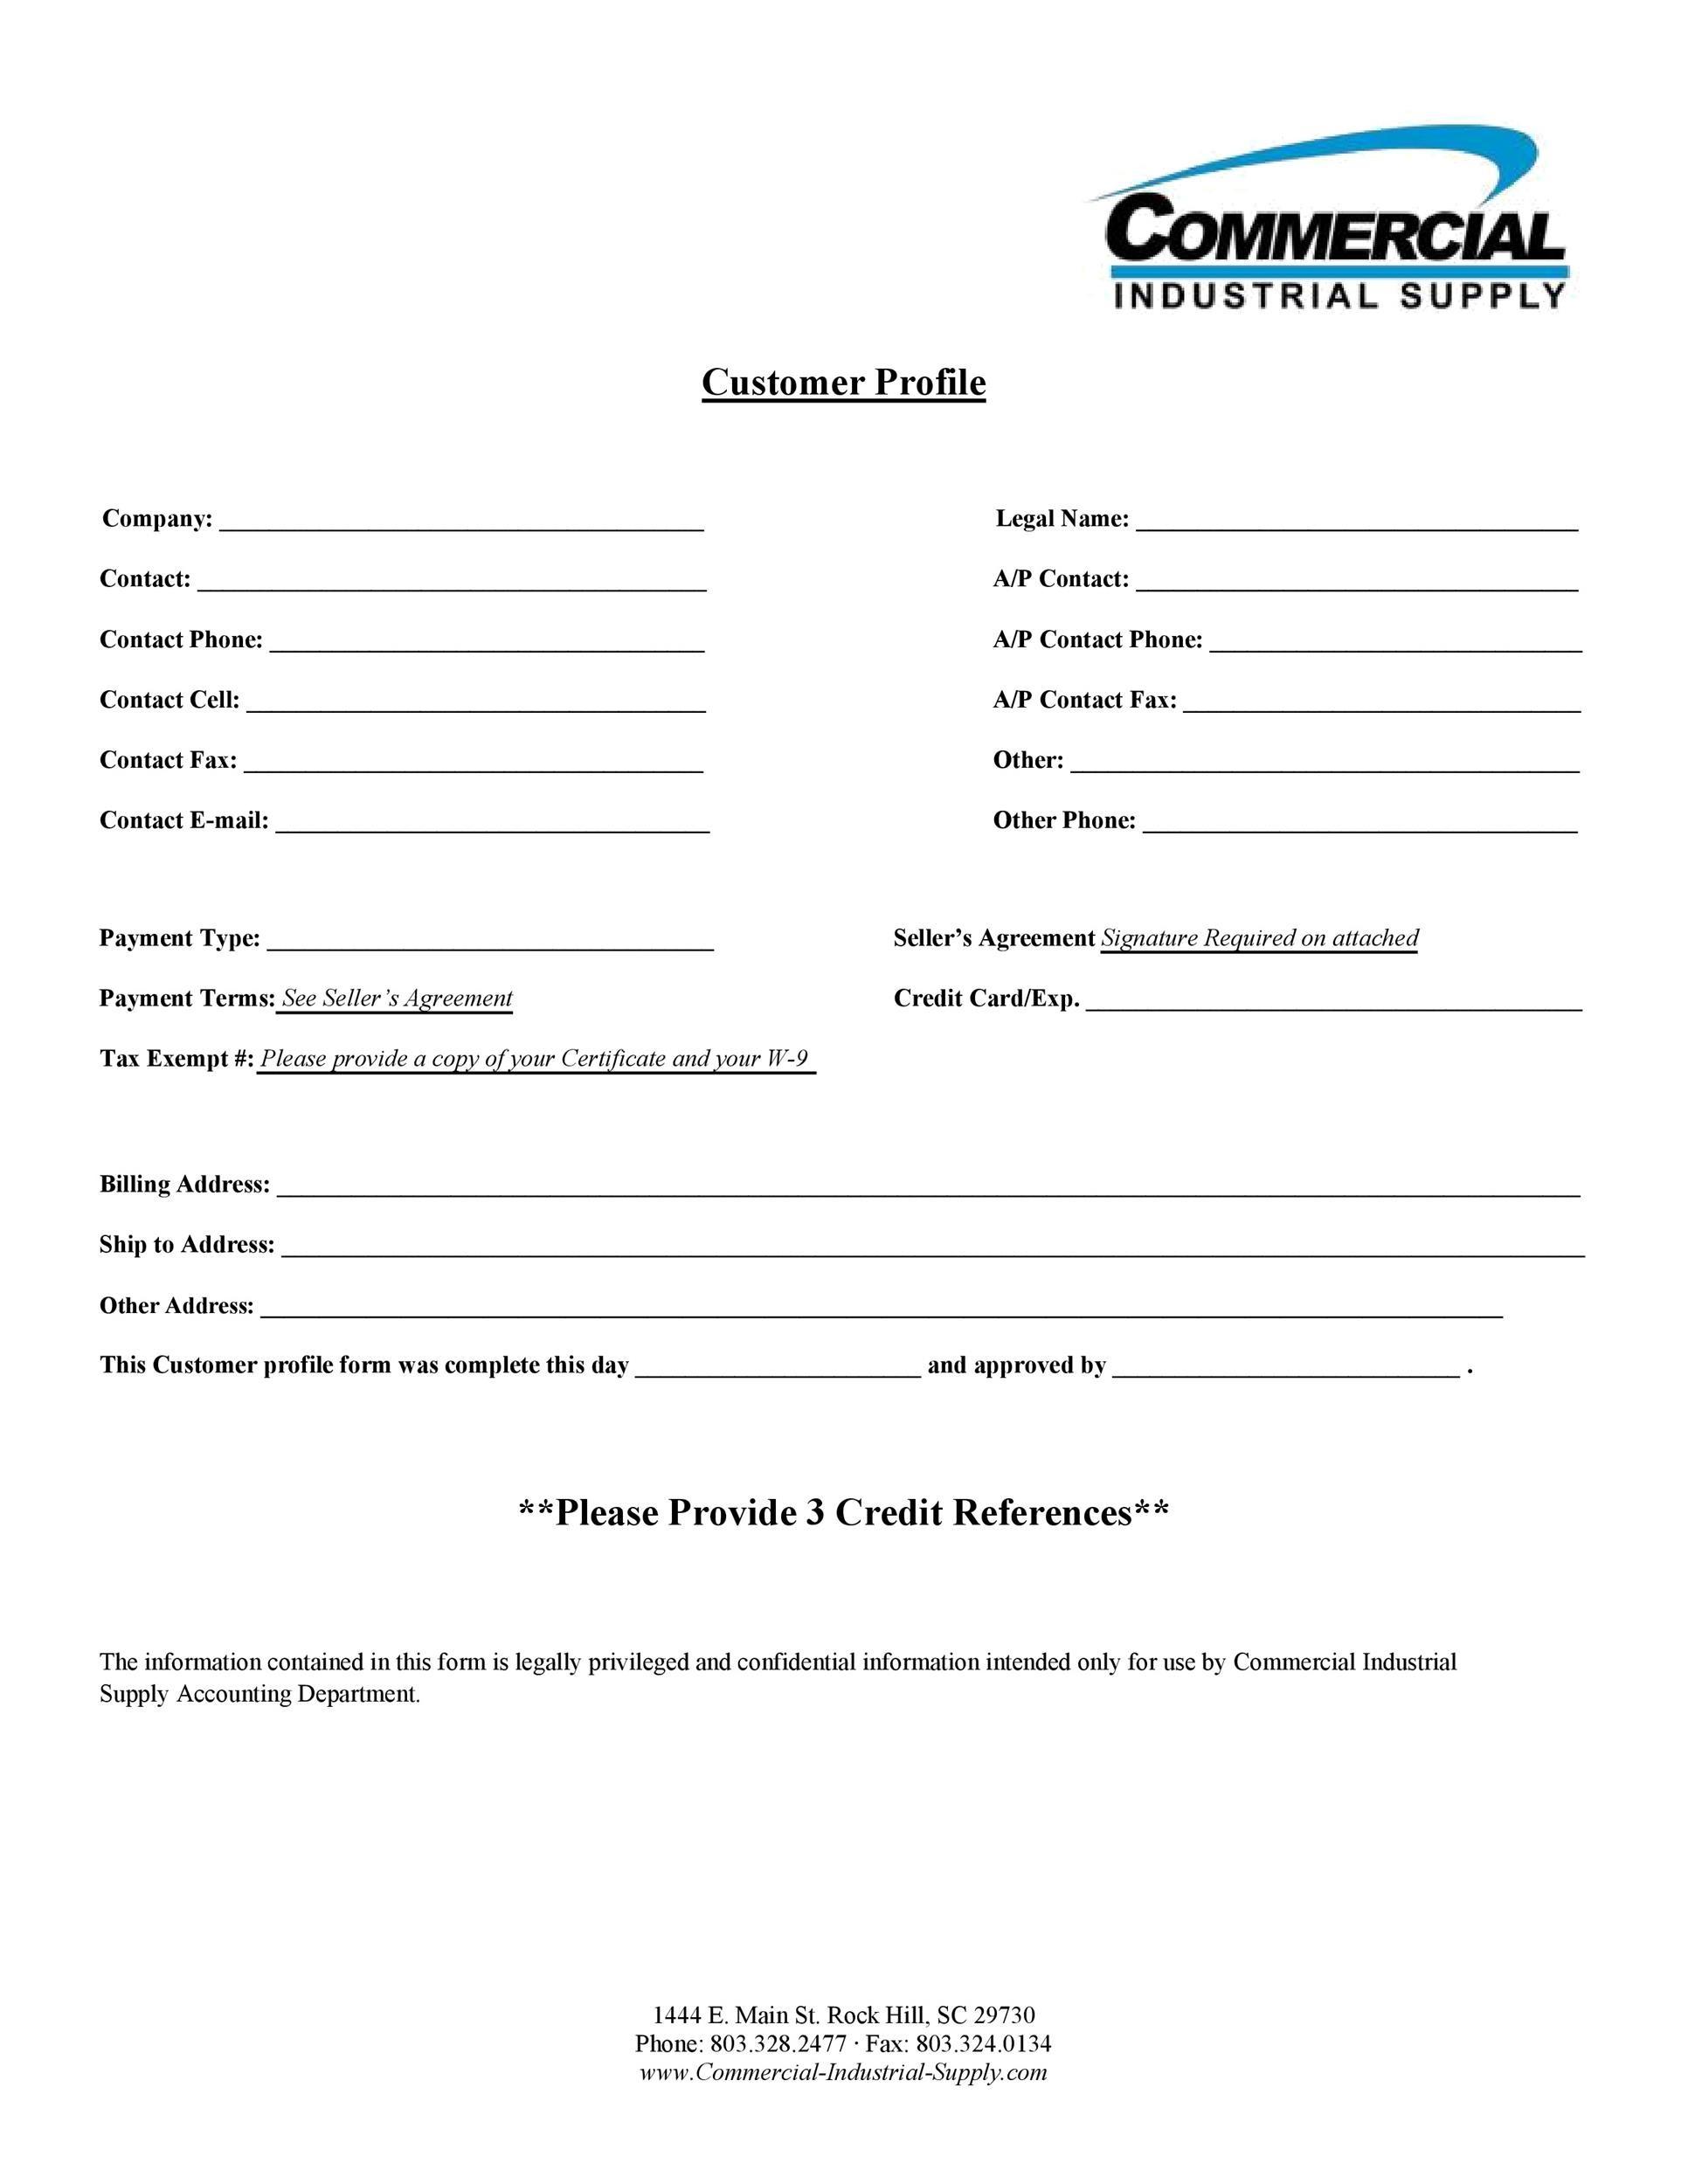 Free customer profile template 28